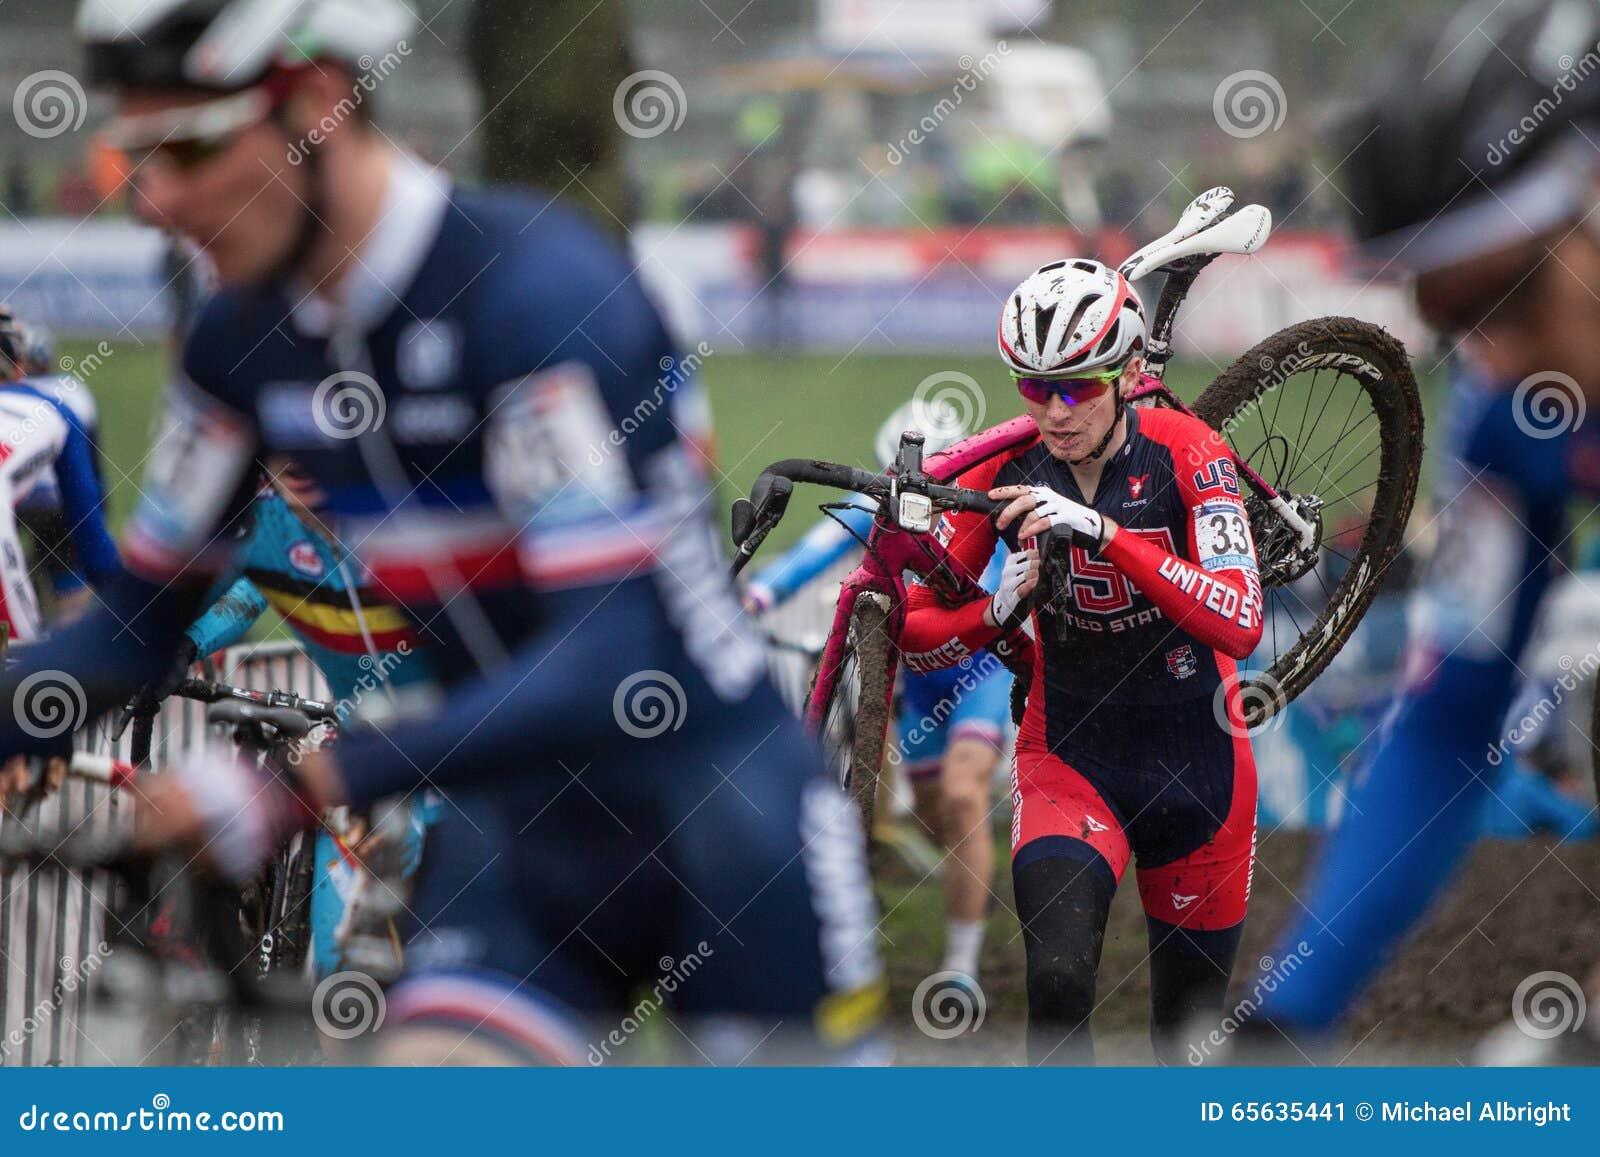 UCI-Wereldbeker Cyclocross - Hoogerheide, Nederland